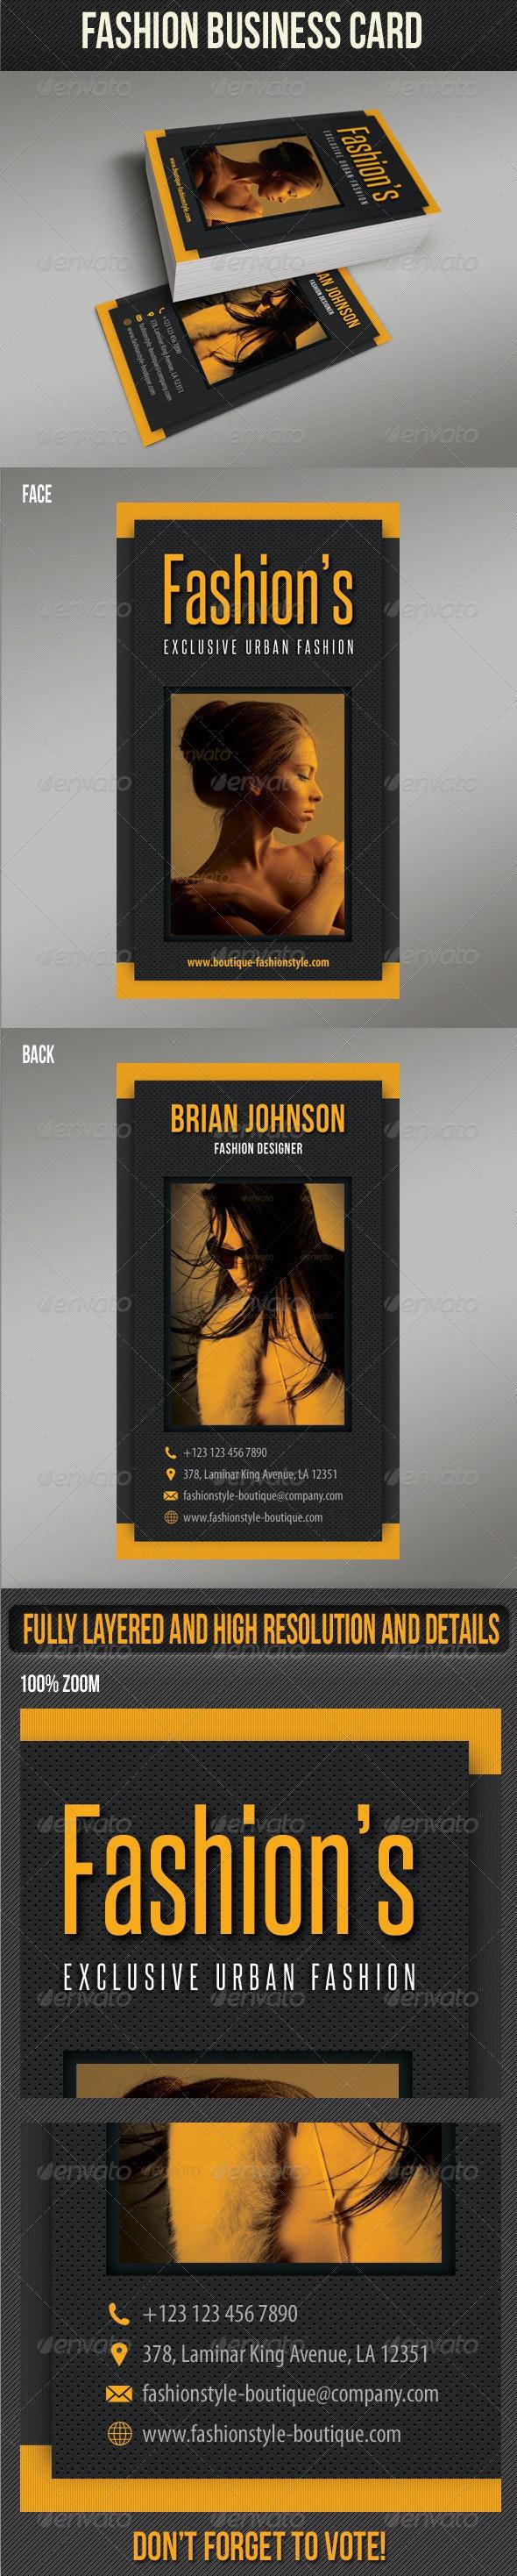 Fashion Business Card 08 - Creative Business Cards